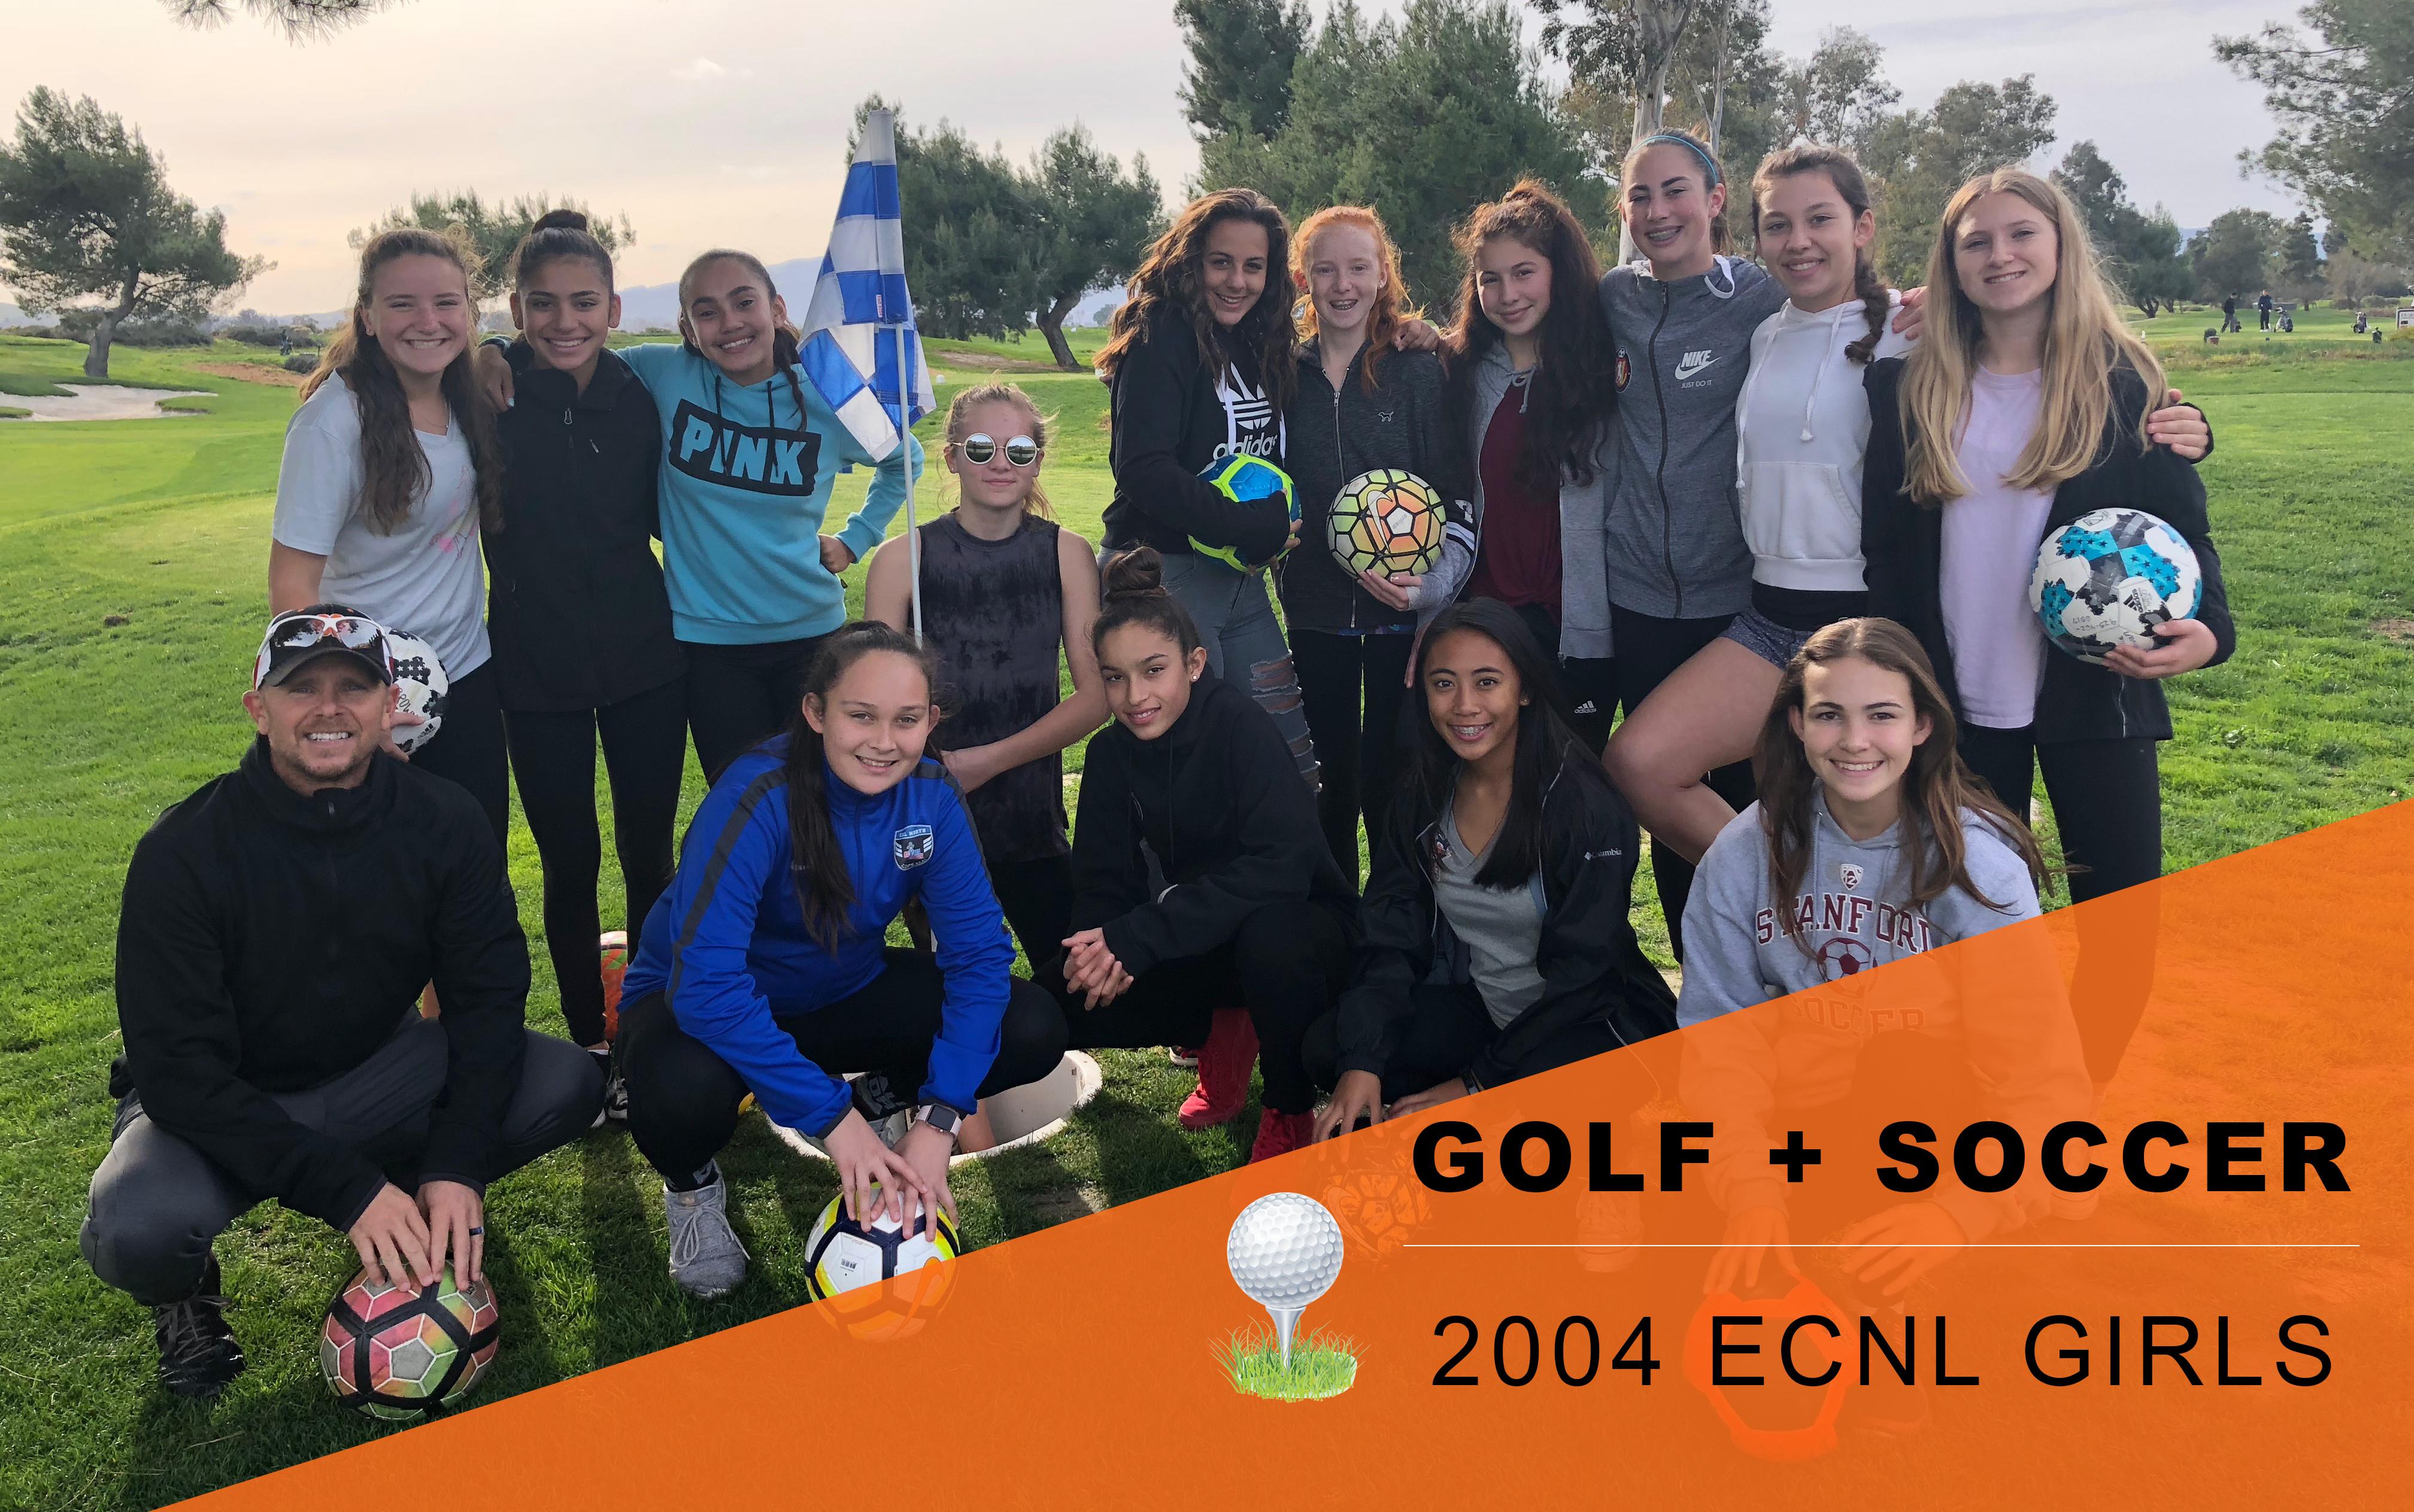 2004 ecnl girls outing